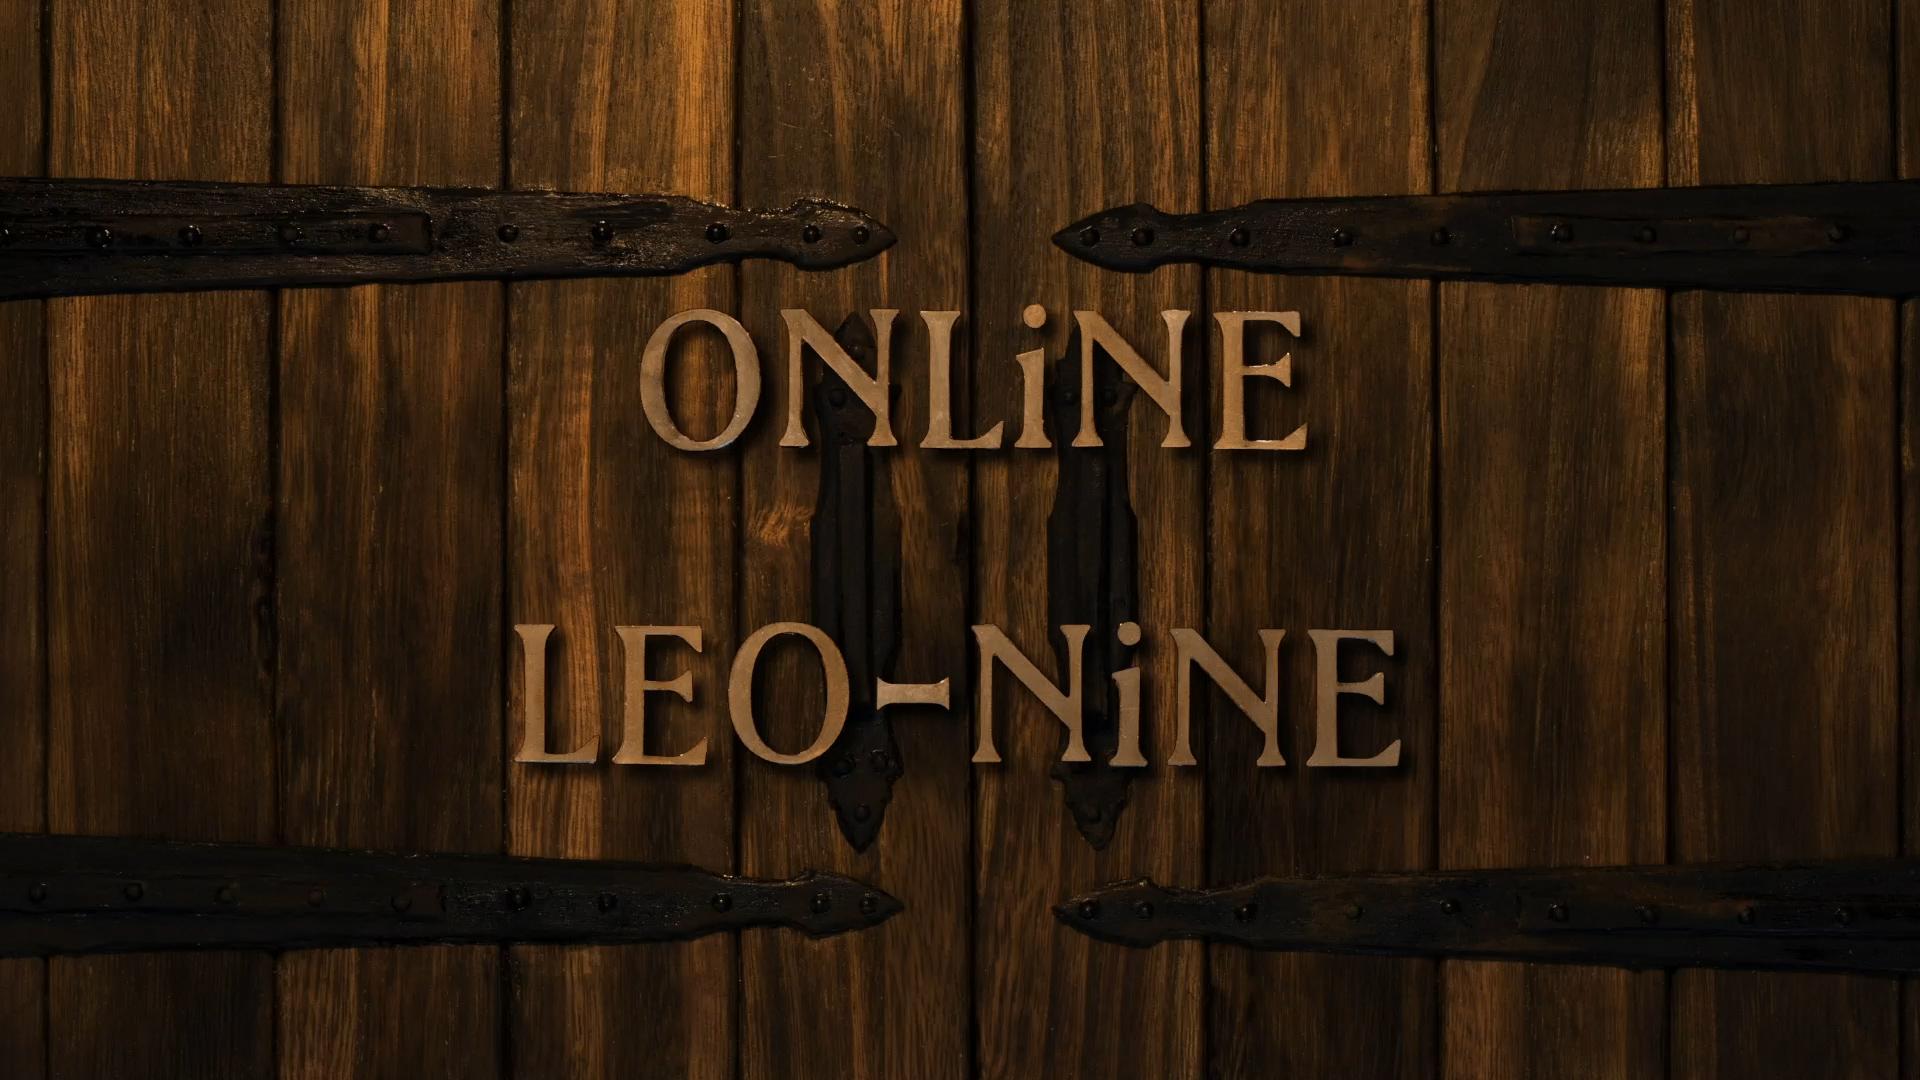 LiSA Online Live 「ONLiNE LEO-NiNE」OP映像